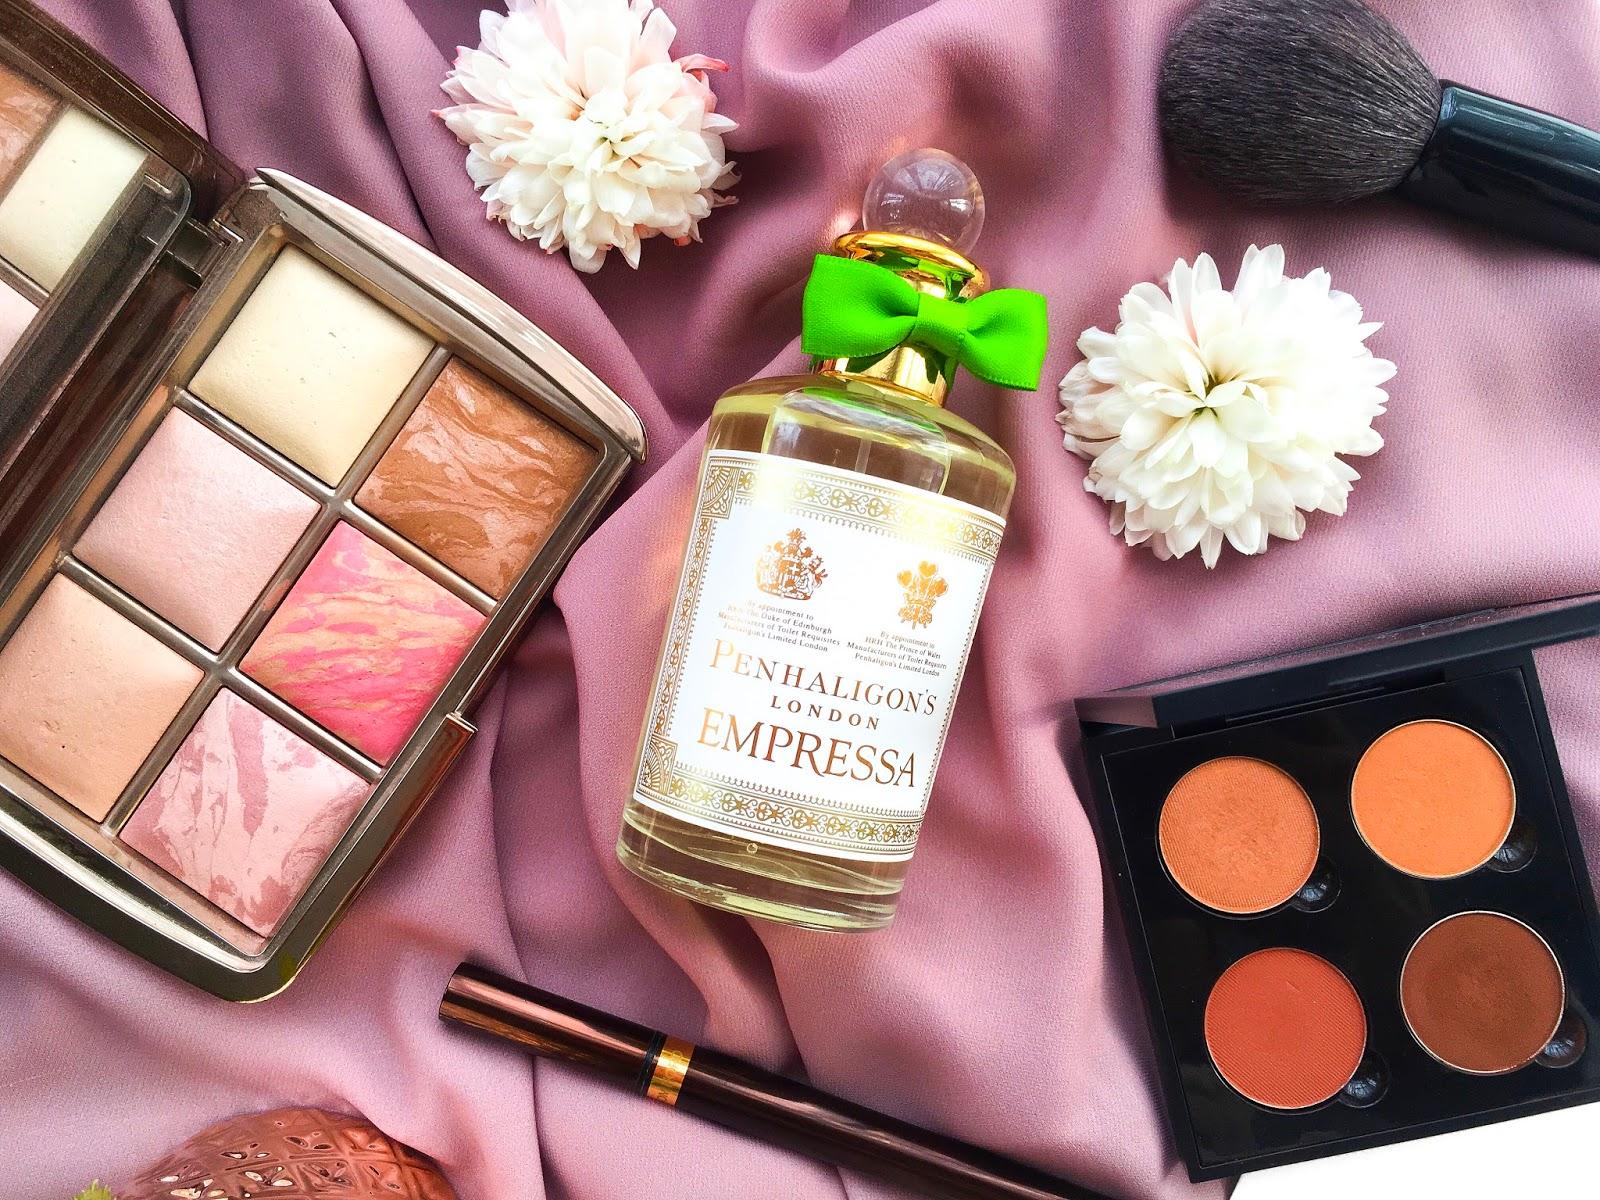 penhaligons empressa, best perfume, luxury perfume,